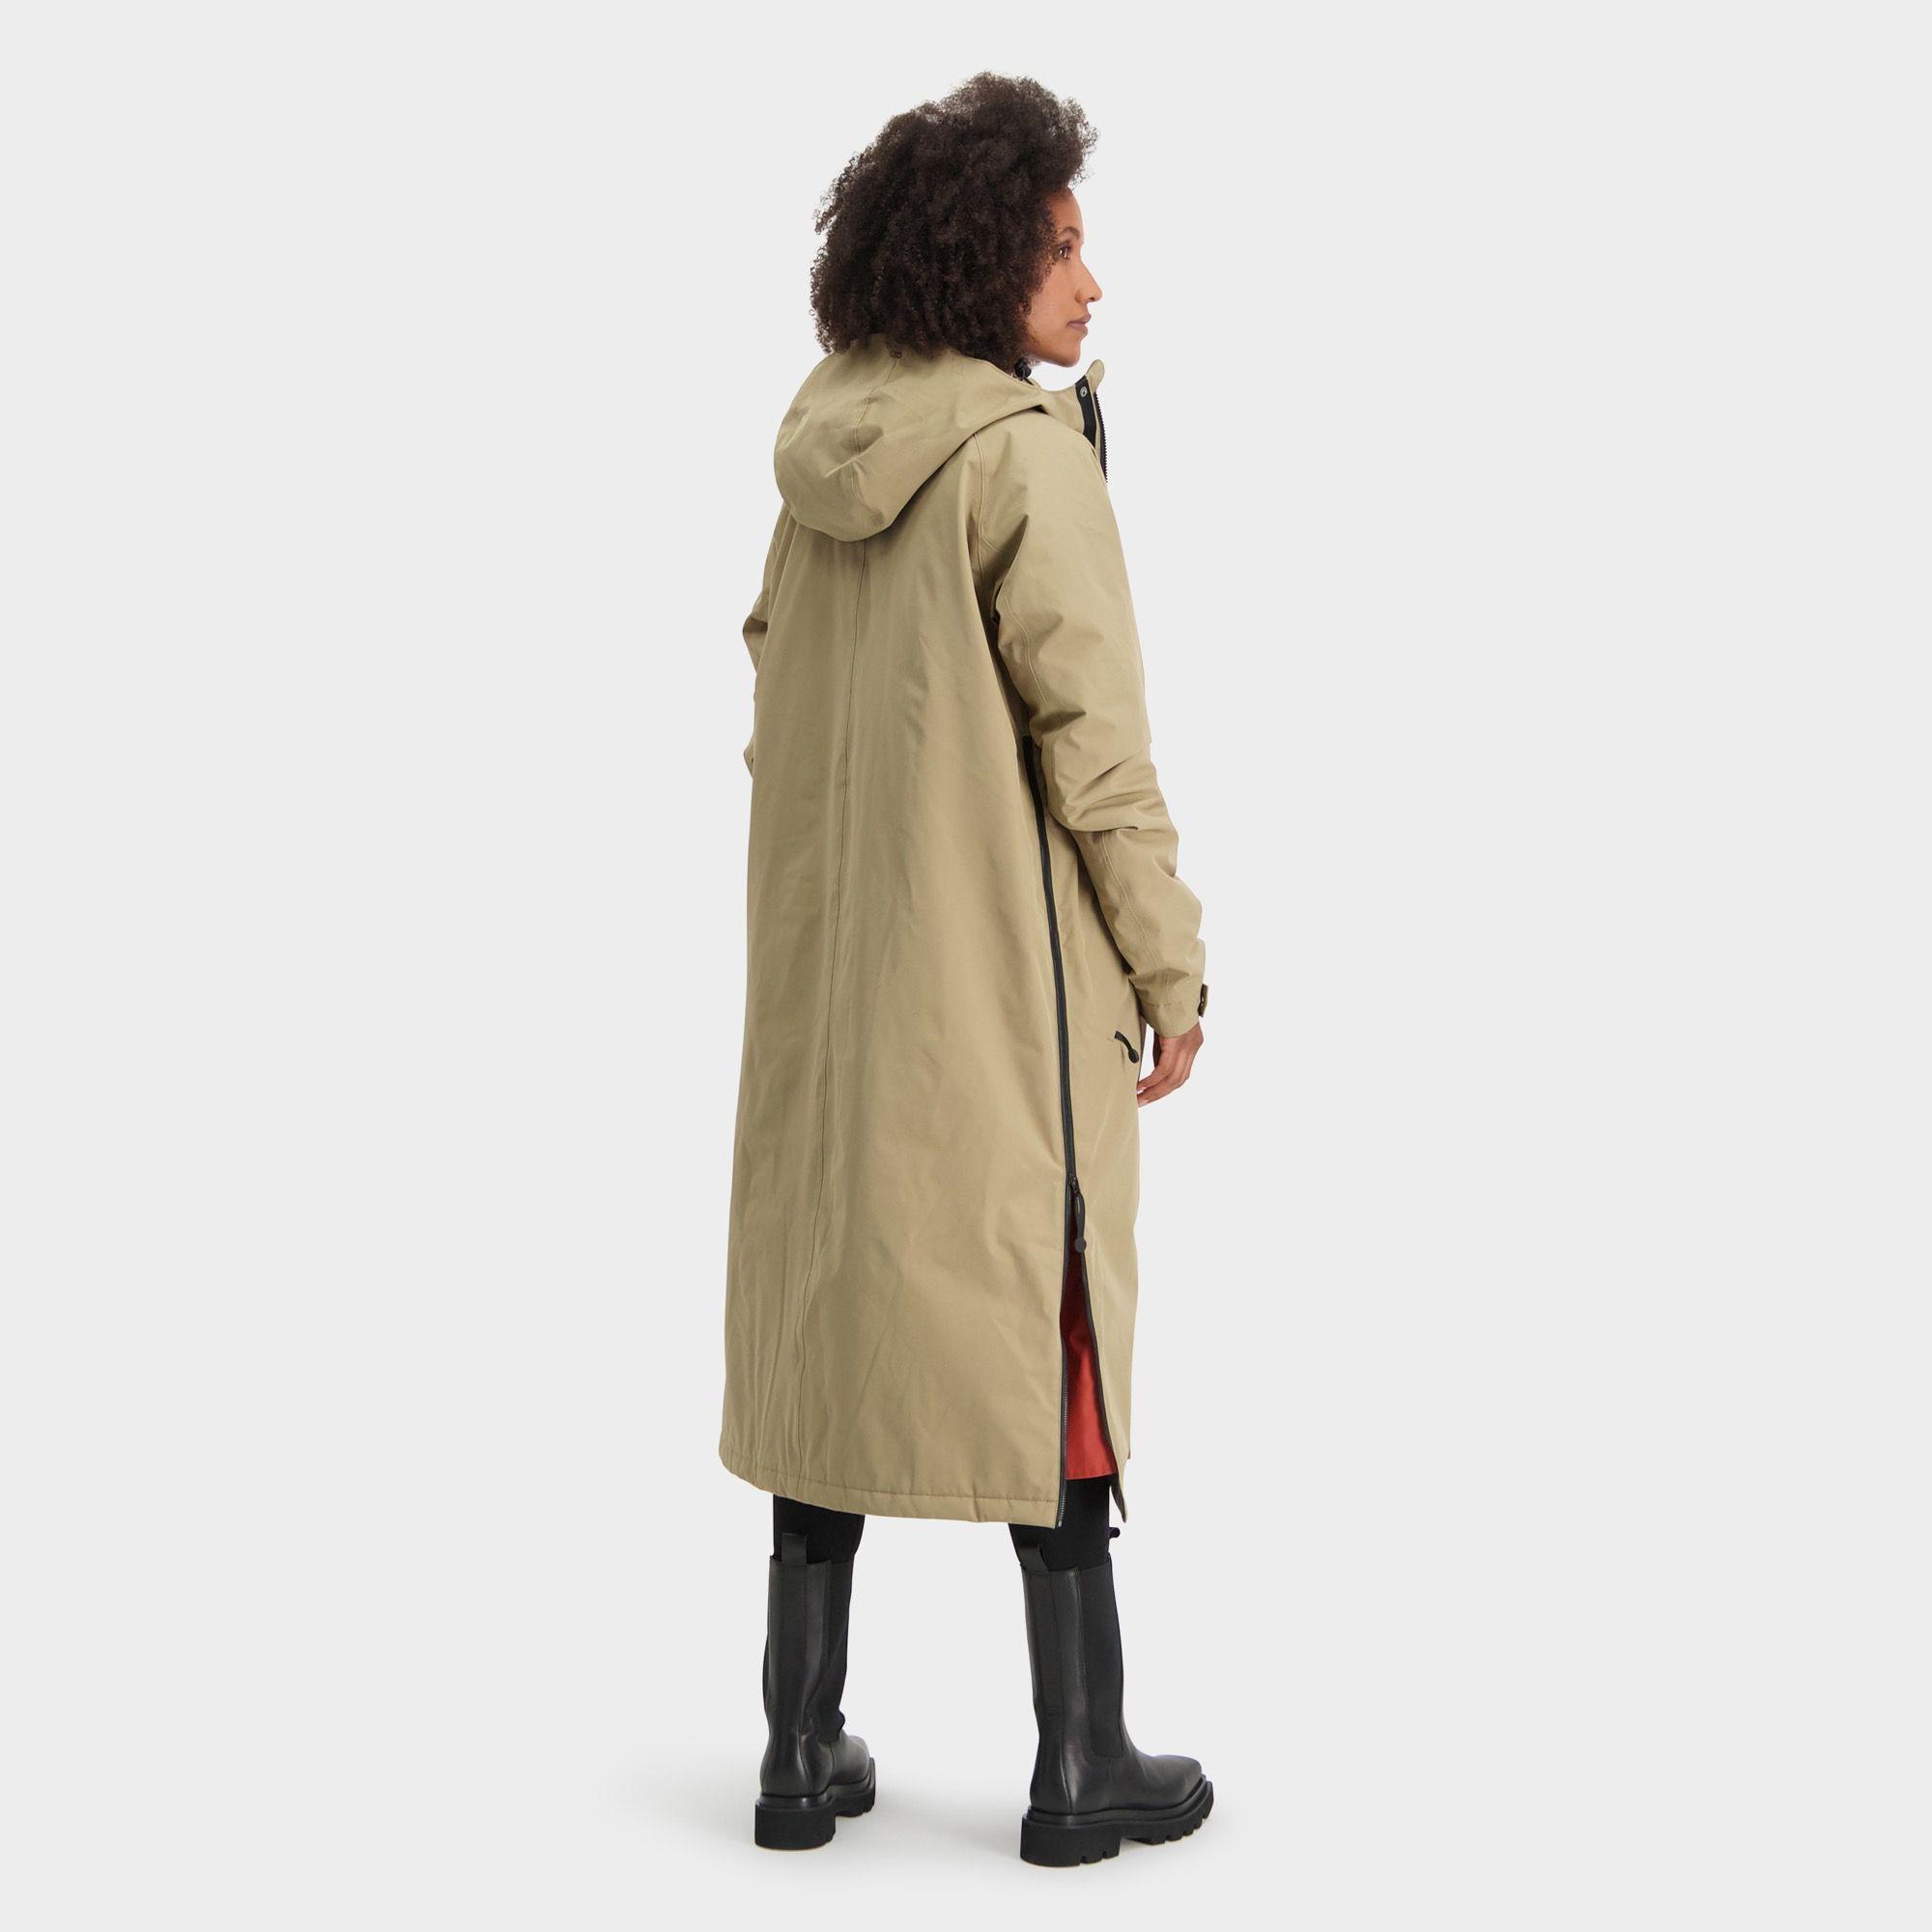 Winter City Slicker Rain Jacket Urban Outdoor fit example